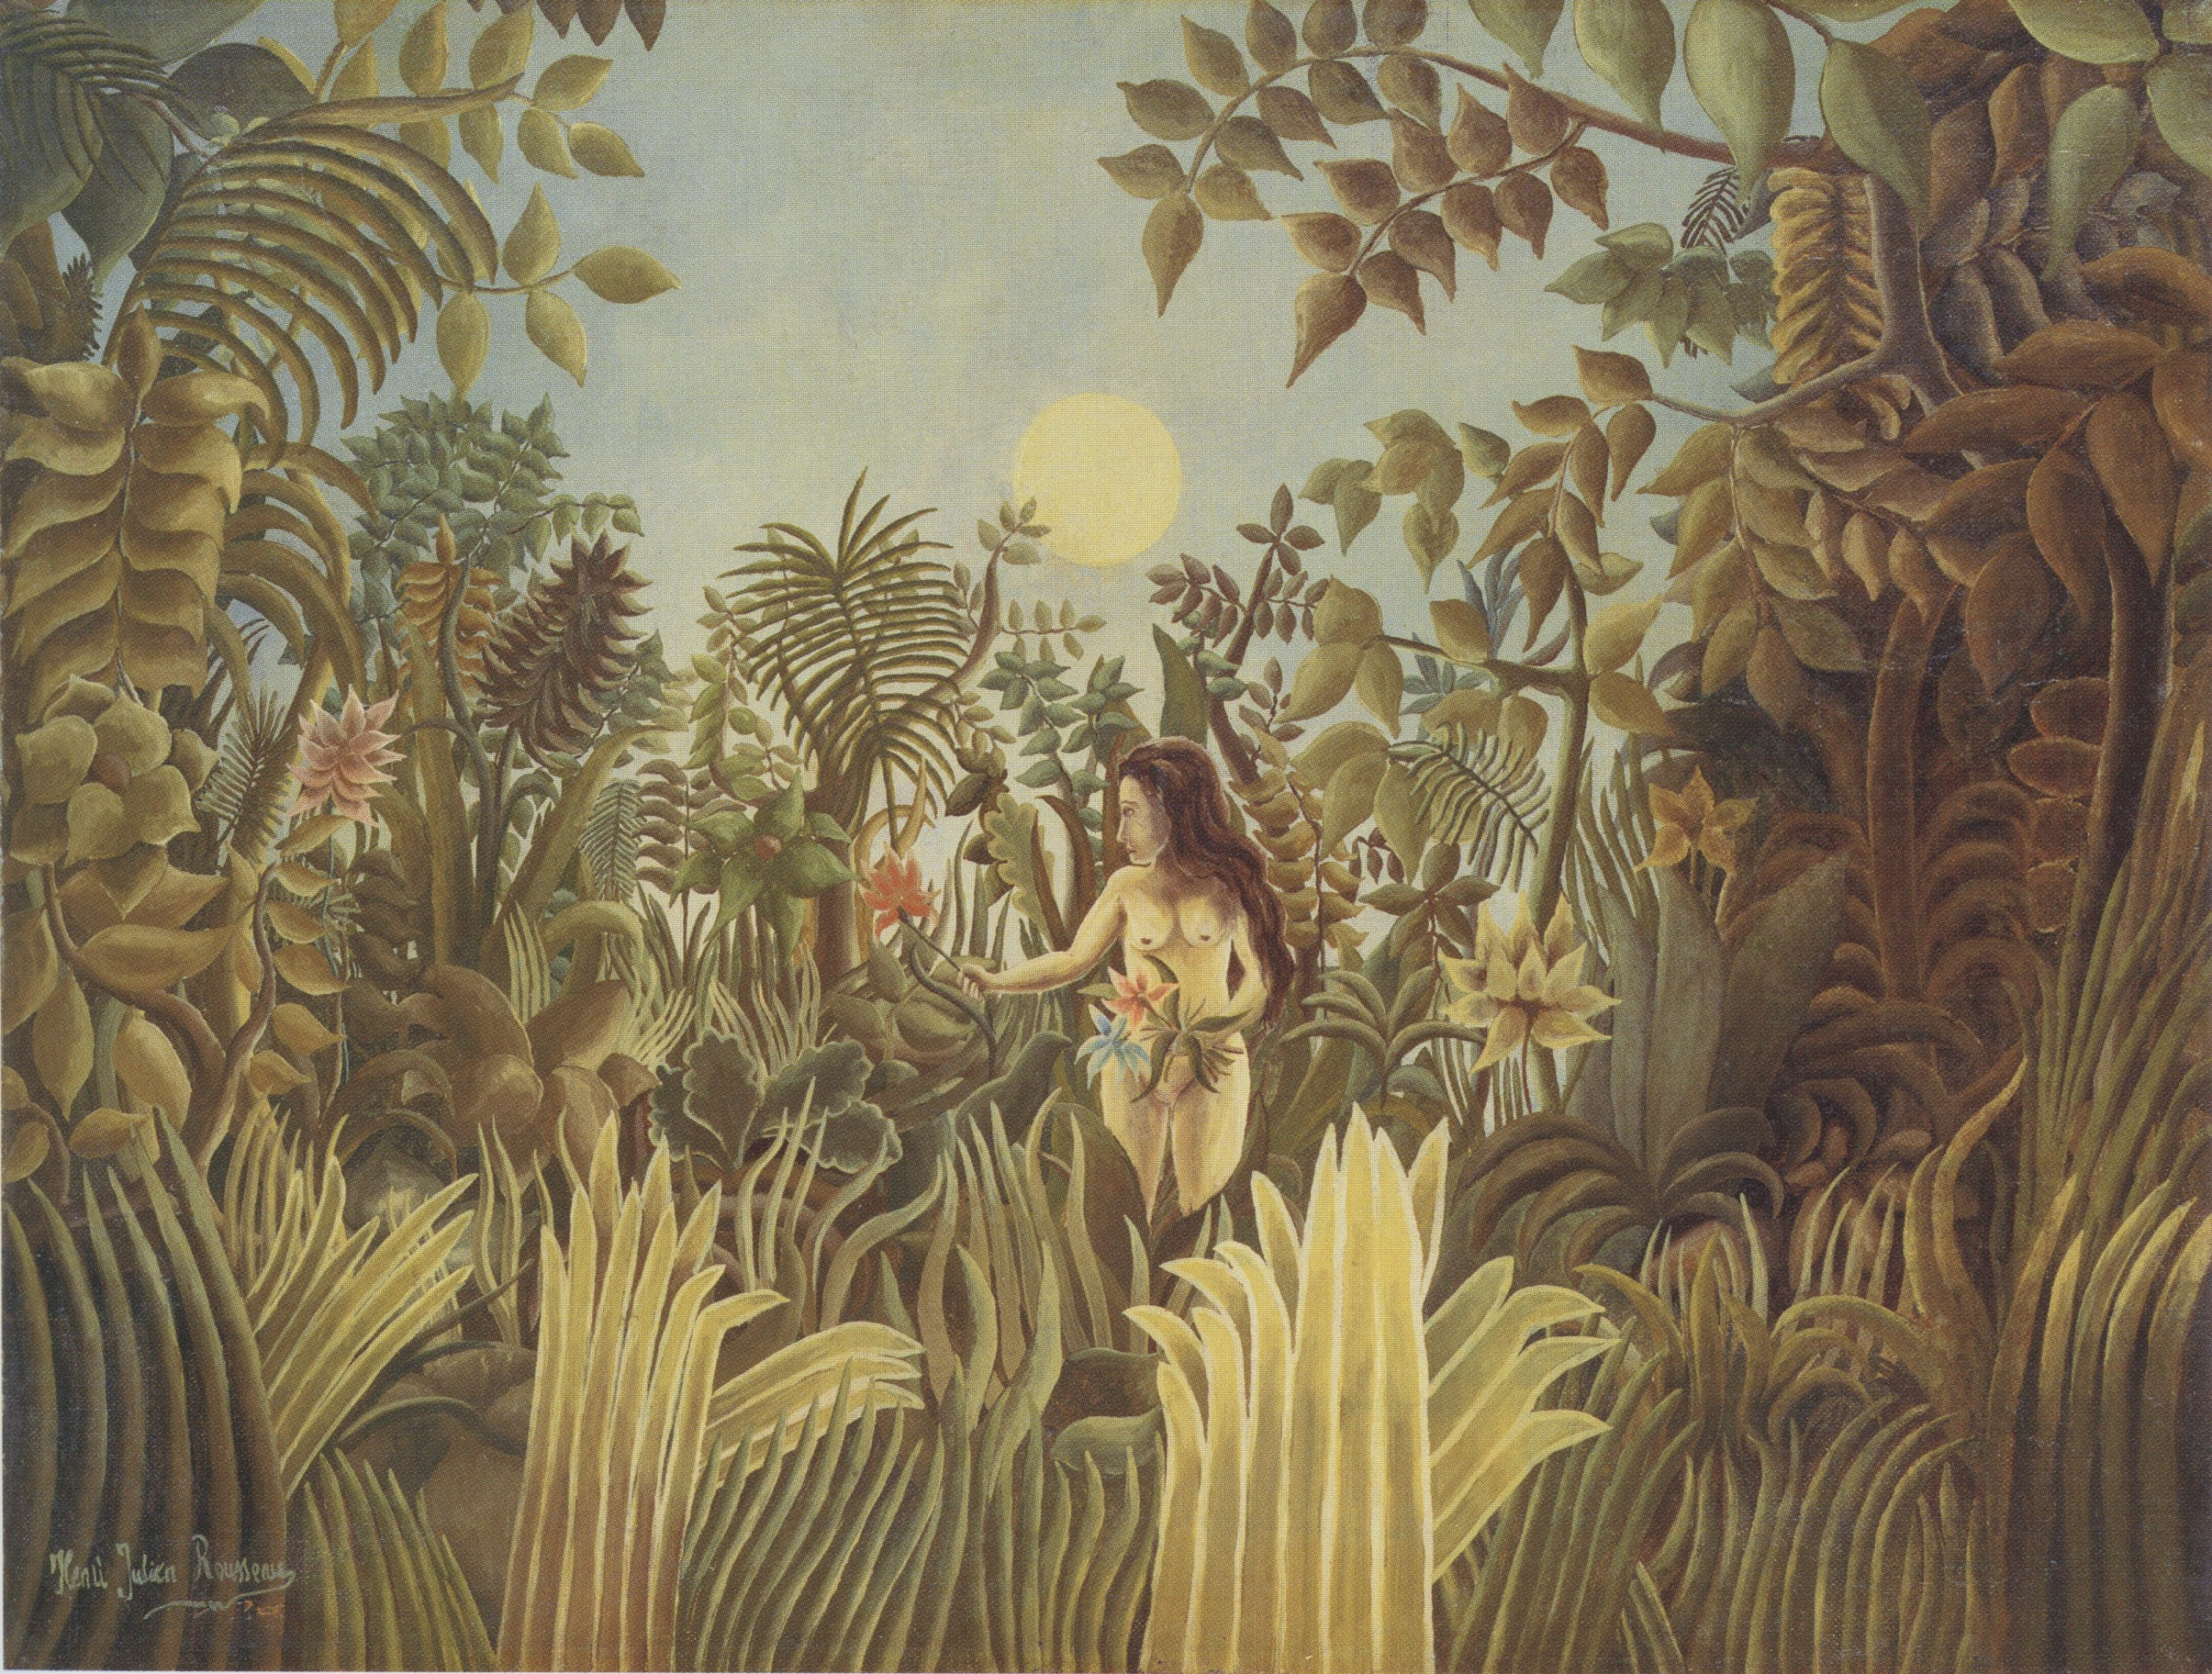 File:Henri Rousseau - Eve in the Garden of Eden.jpg - Wikimedia Commons